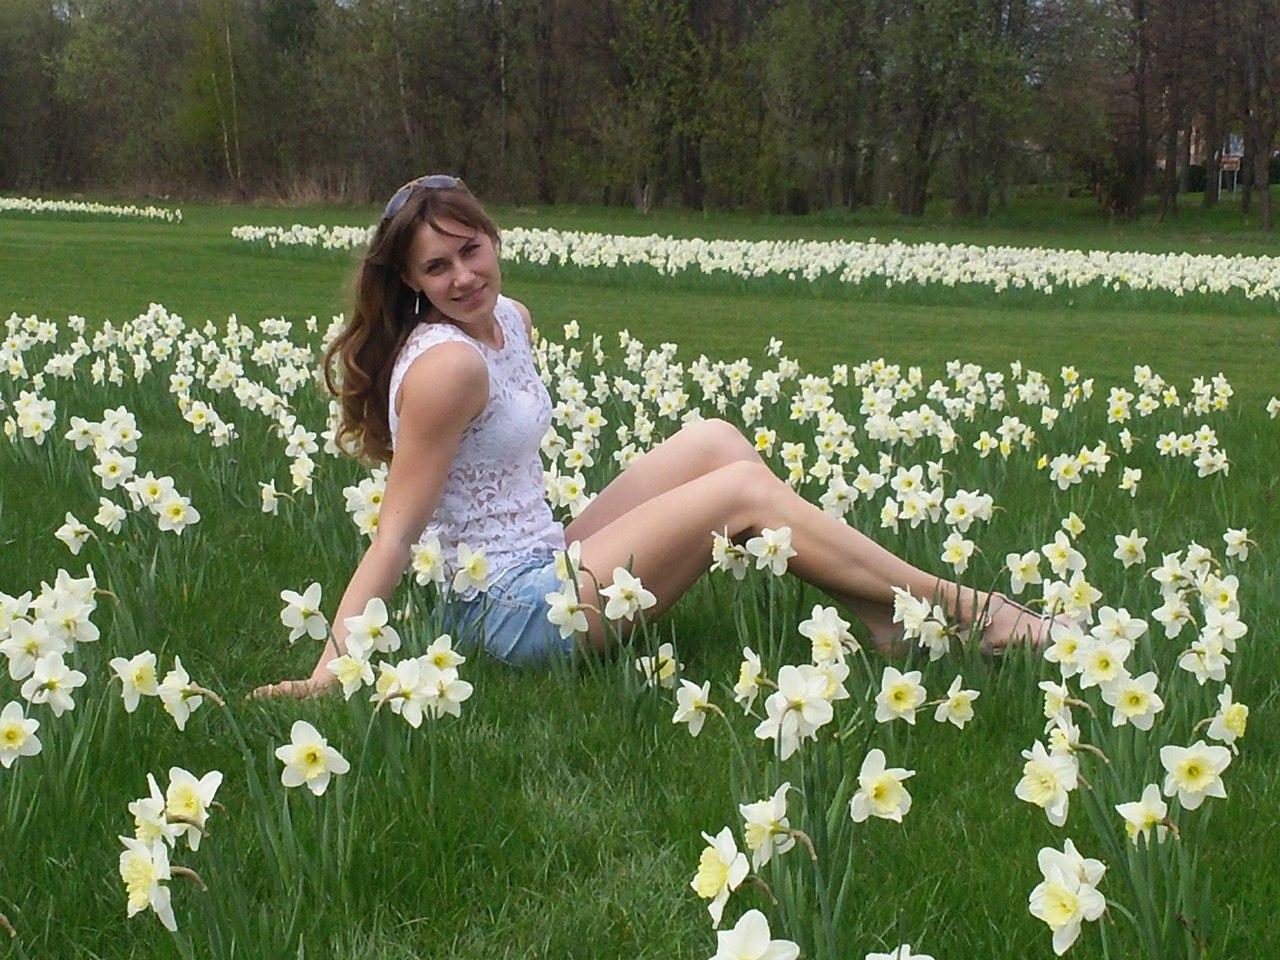 Ekaterina Nikisheva on a flower field  │ Image Source: Katerina Nikisheva